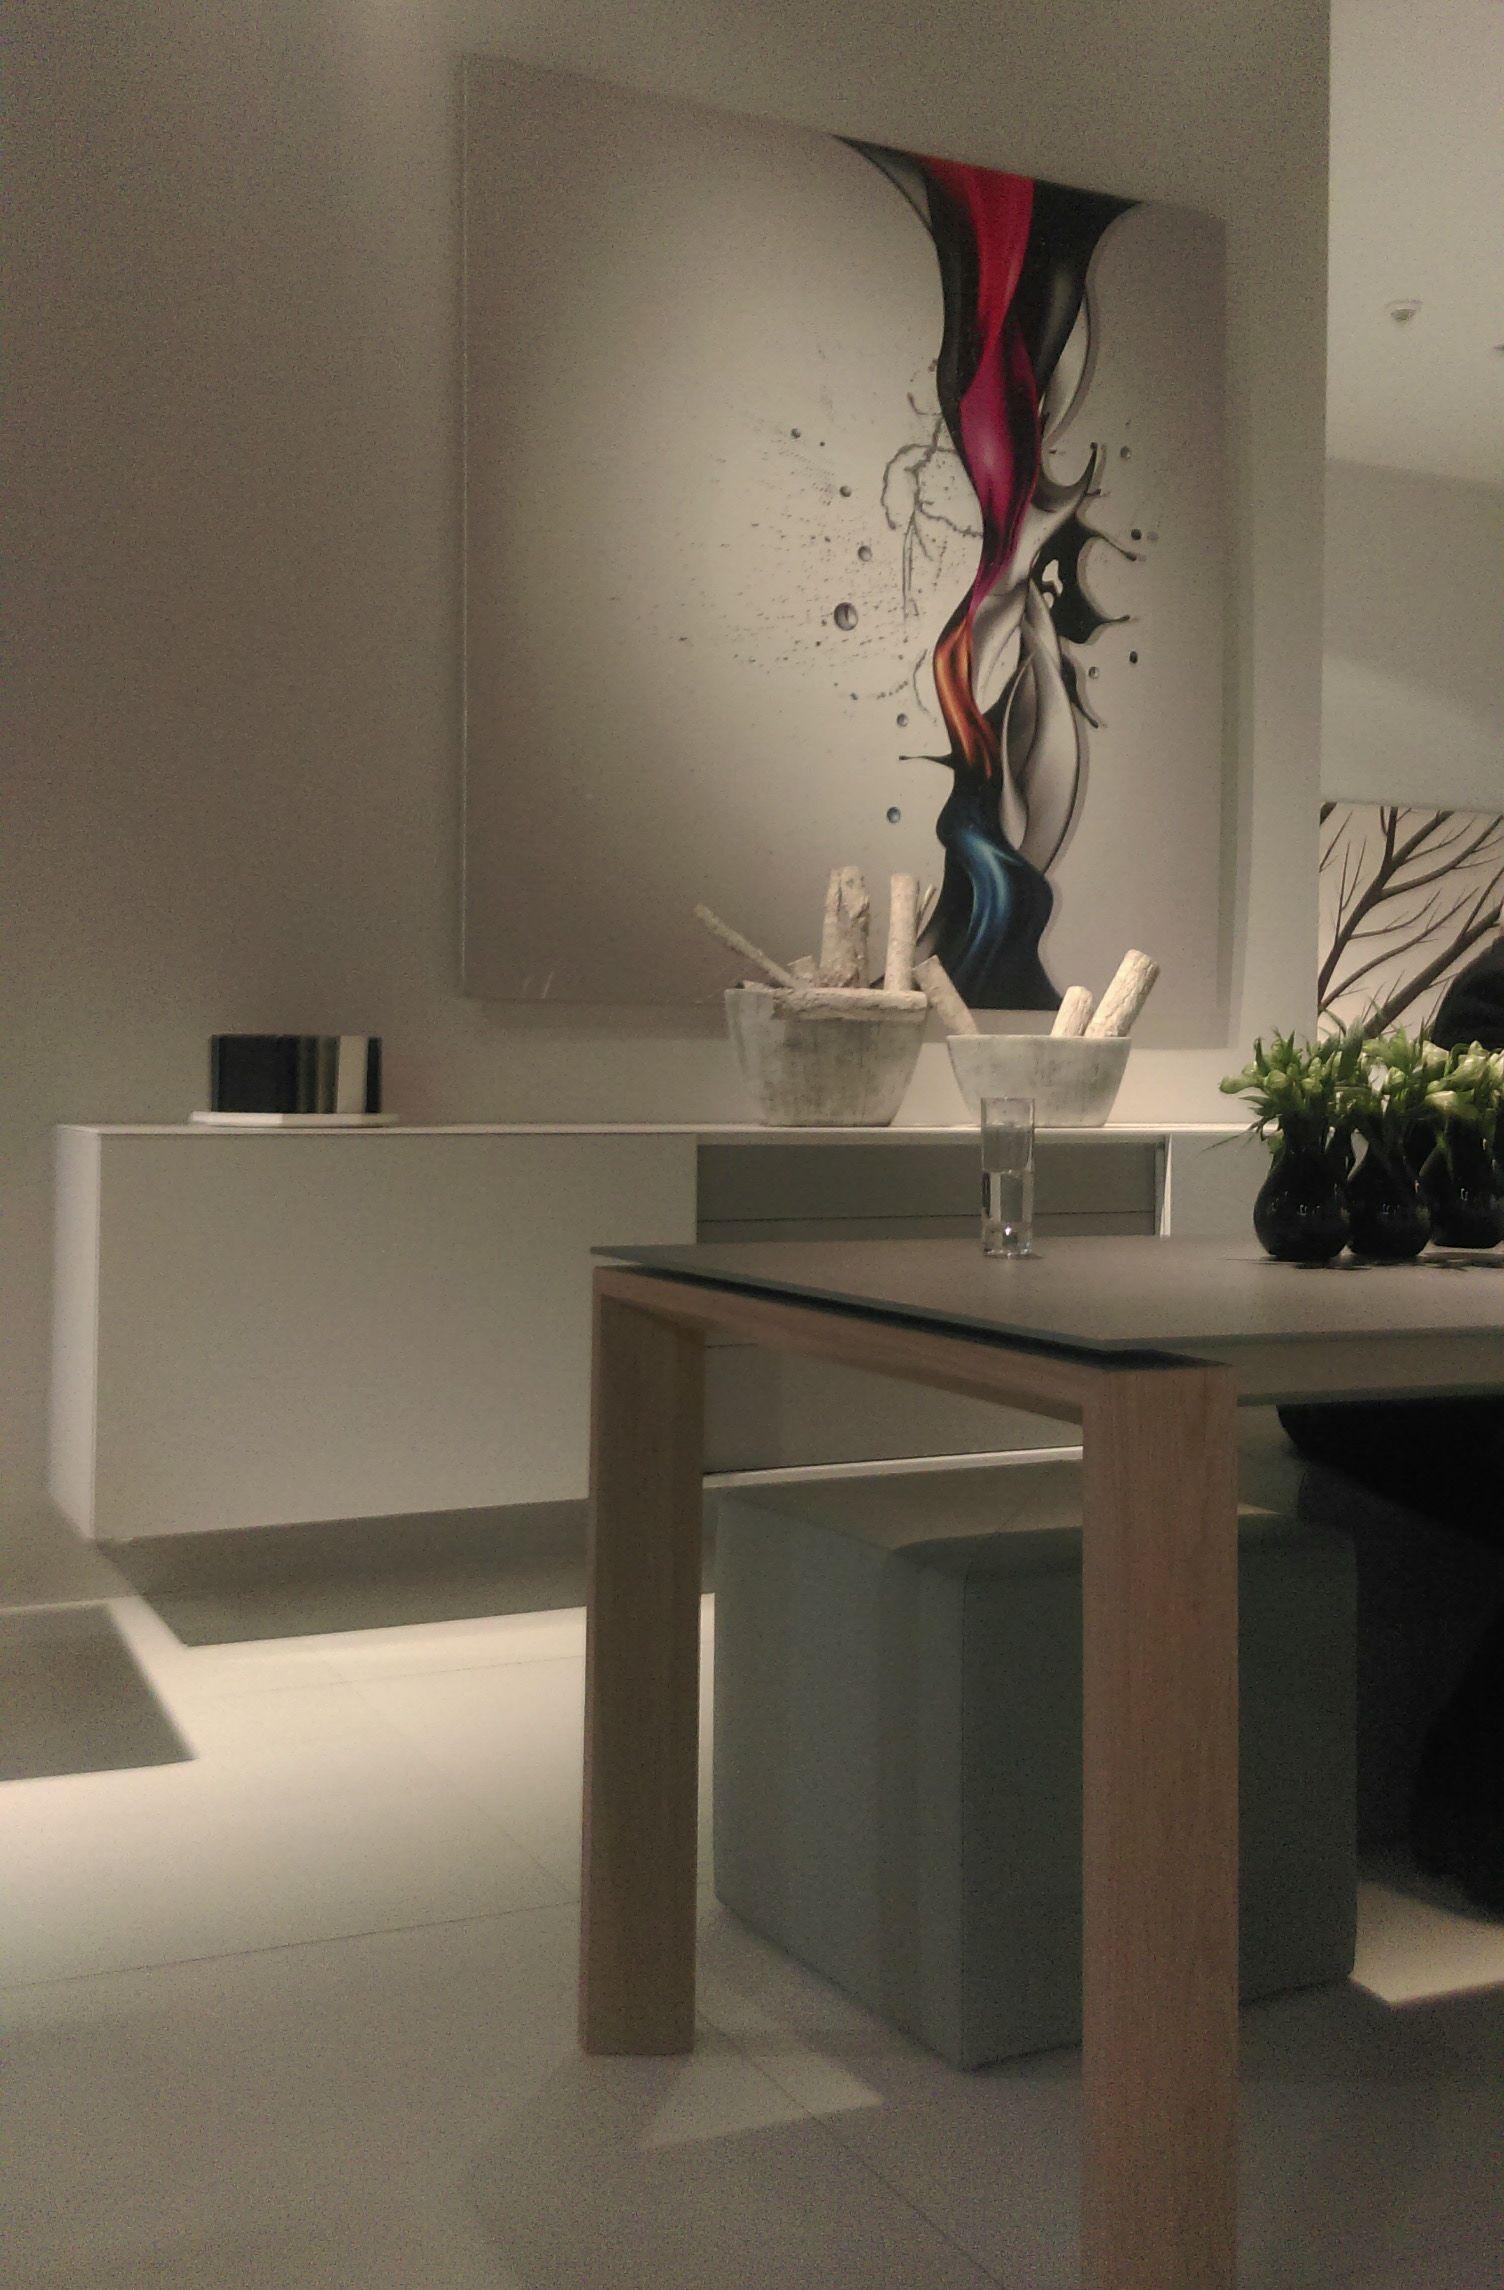 Karat - Eurlings Interieurs | Karat bij Eurlings Interieurs | Pinterest